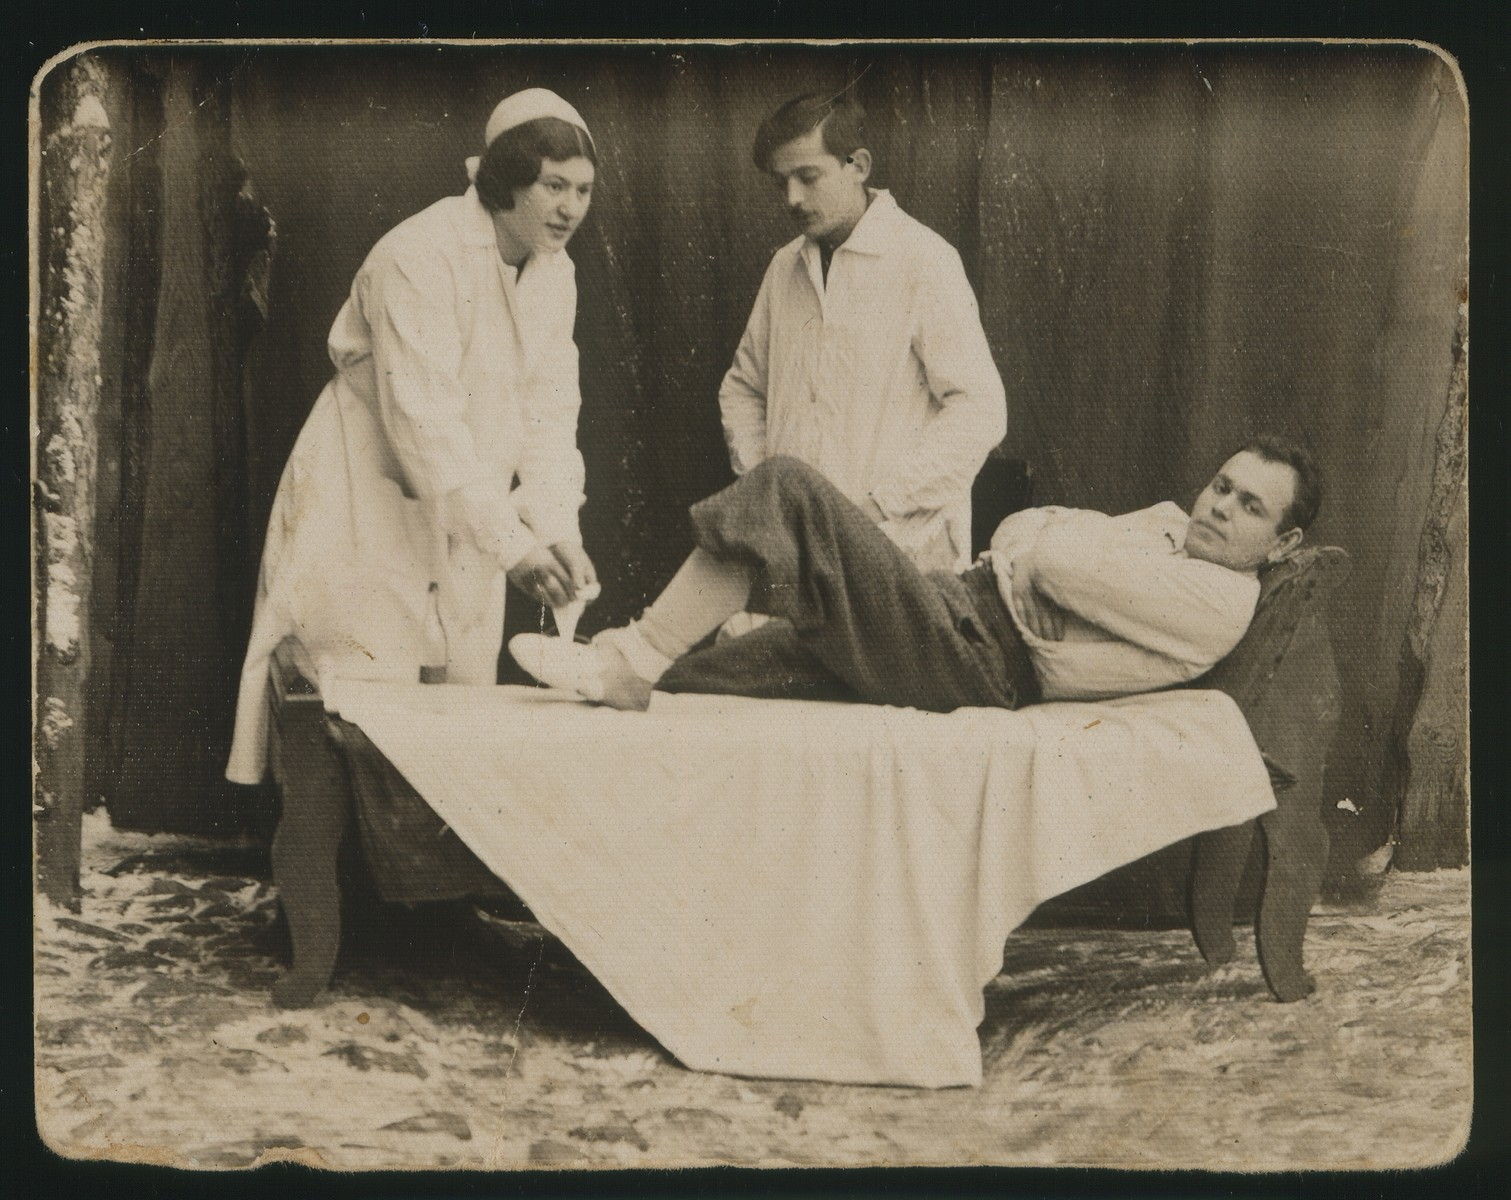 Sara Plotnik, who studied nursing in Vilna, bandages the leg of a friend.